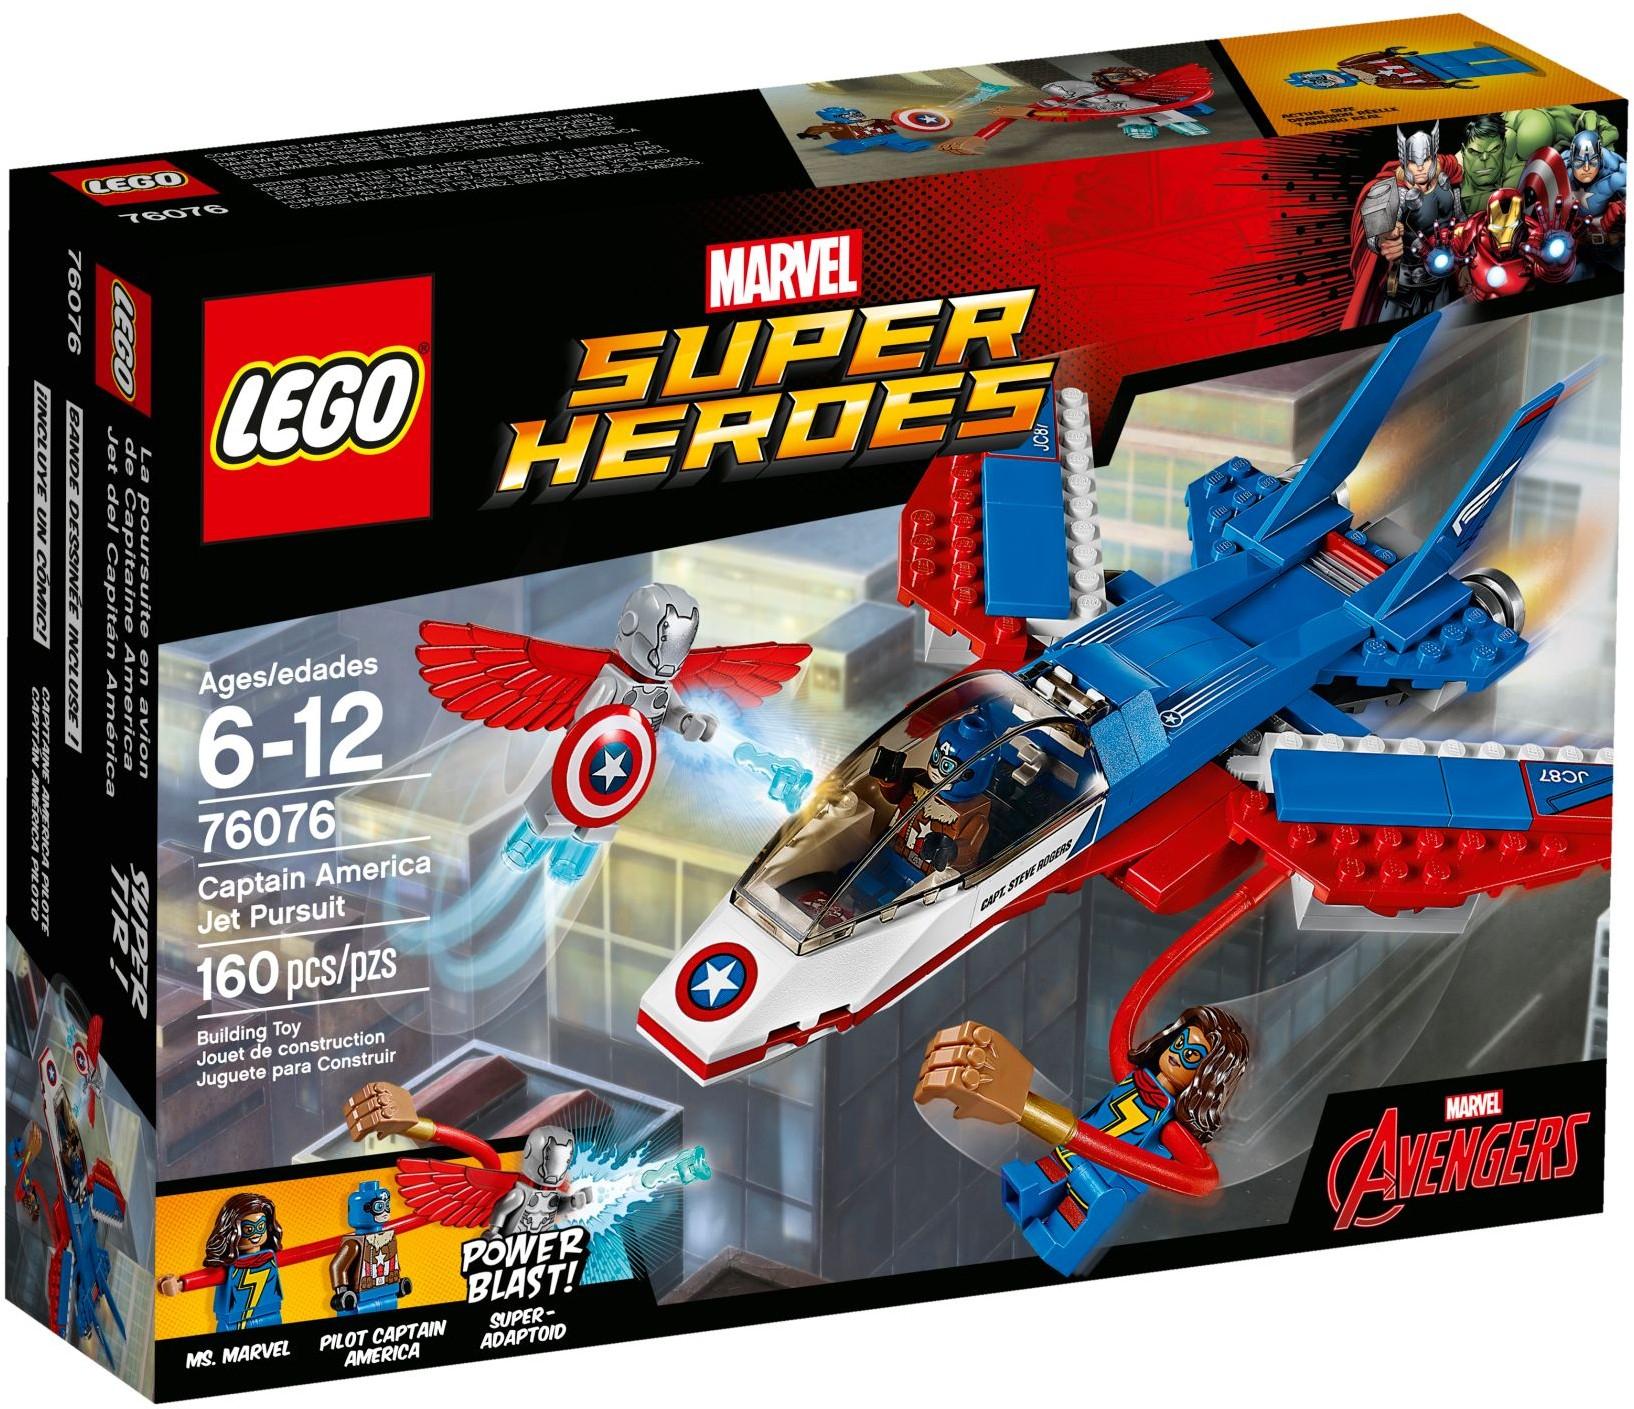 Lego Marvel Super Heroes Captain America Jet Pursuit 76076 £16 @ Hamley's